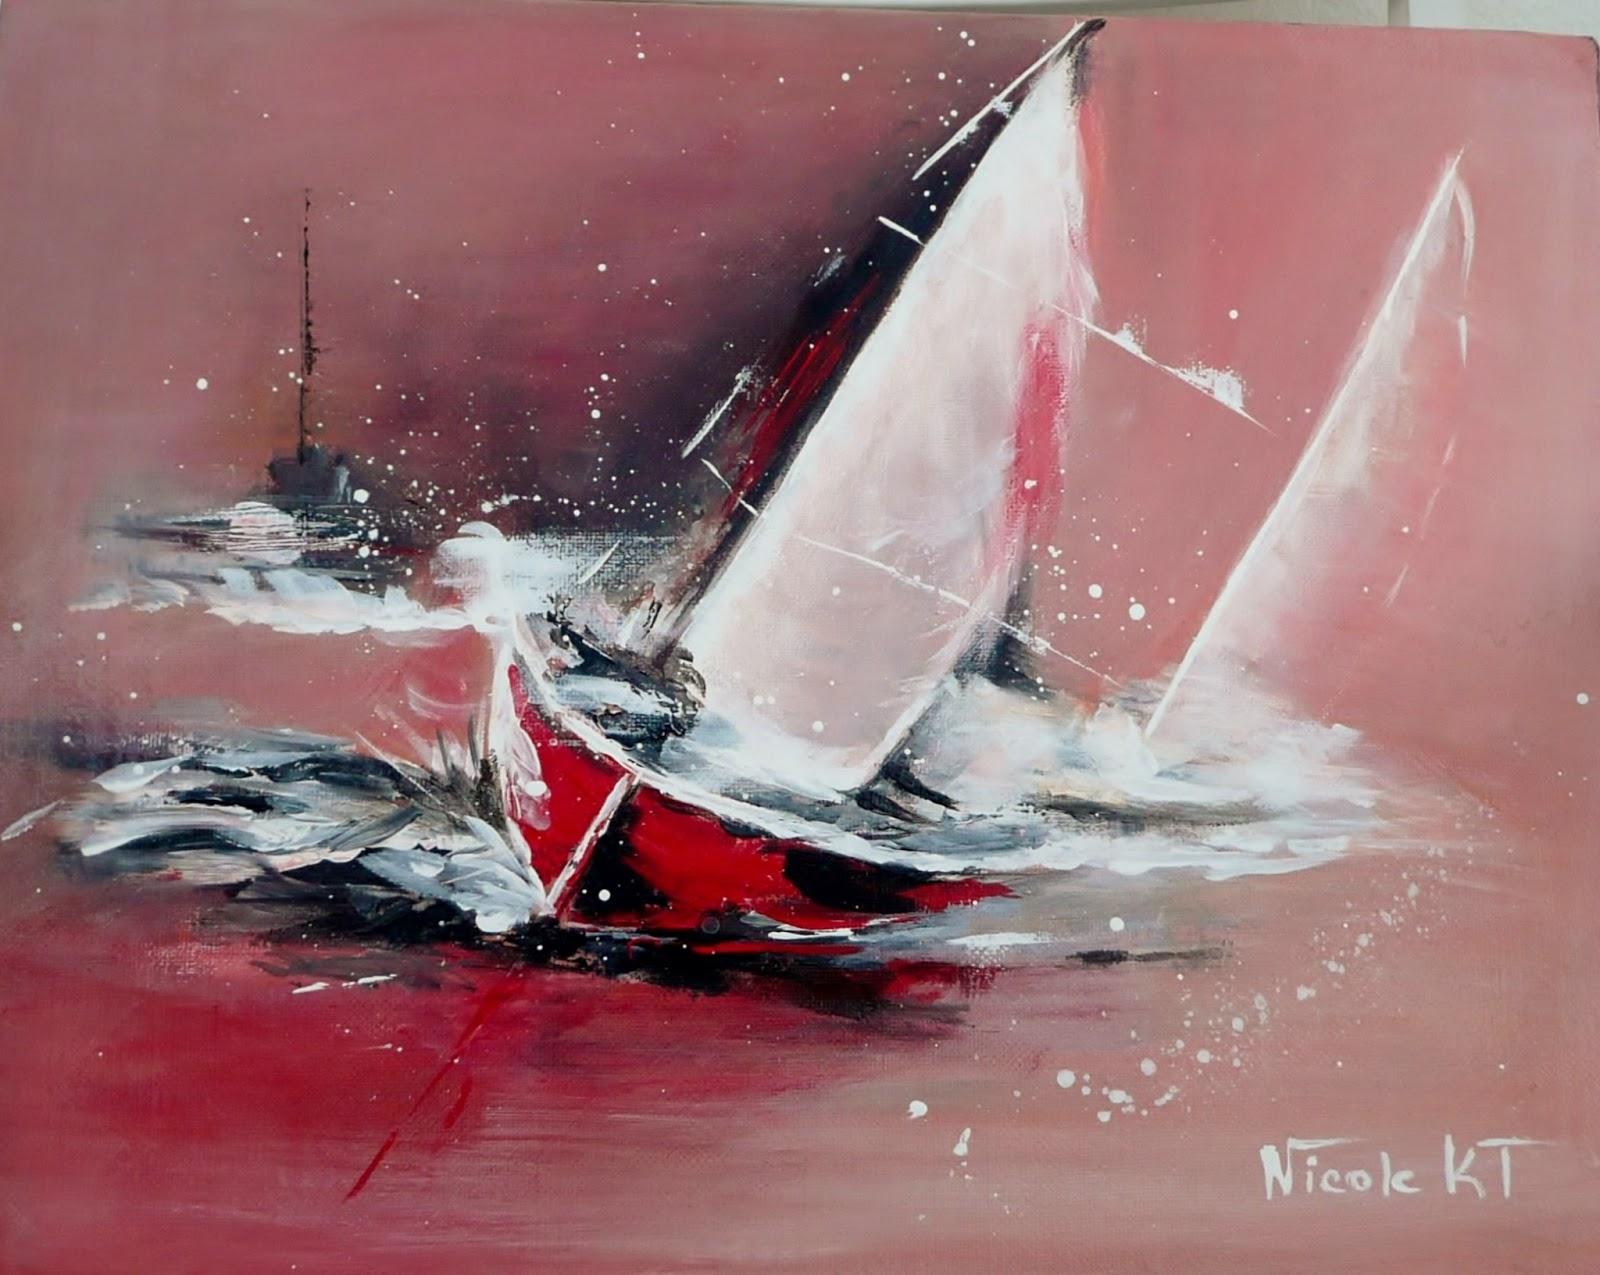 Nicole catt artiste peintre - Peinture contemporaine au couteau ...